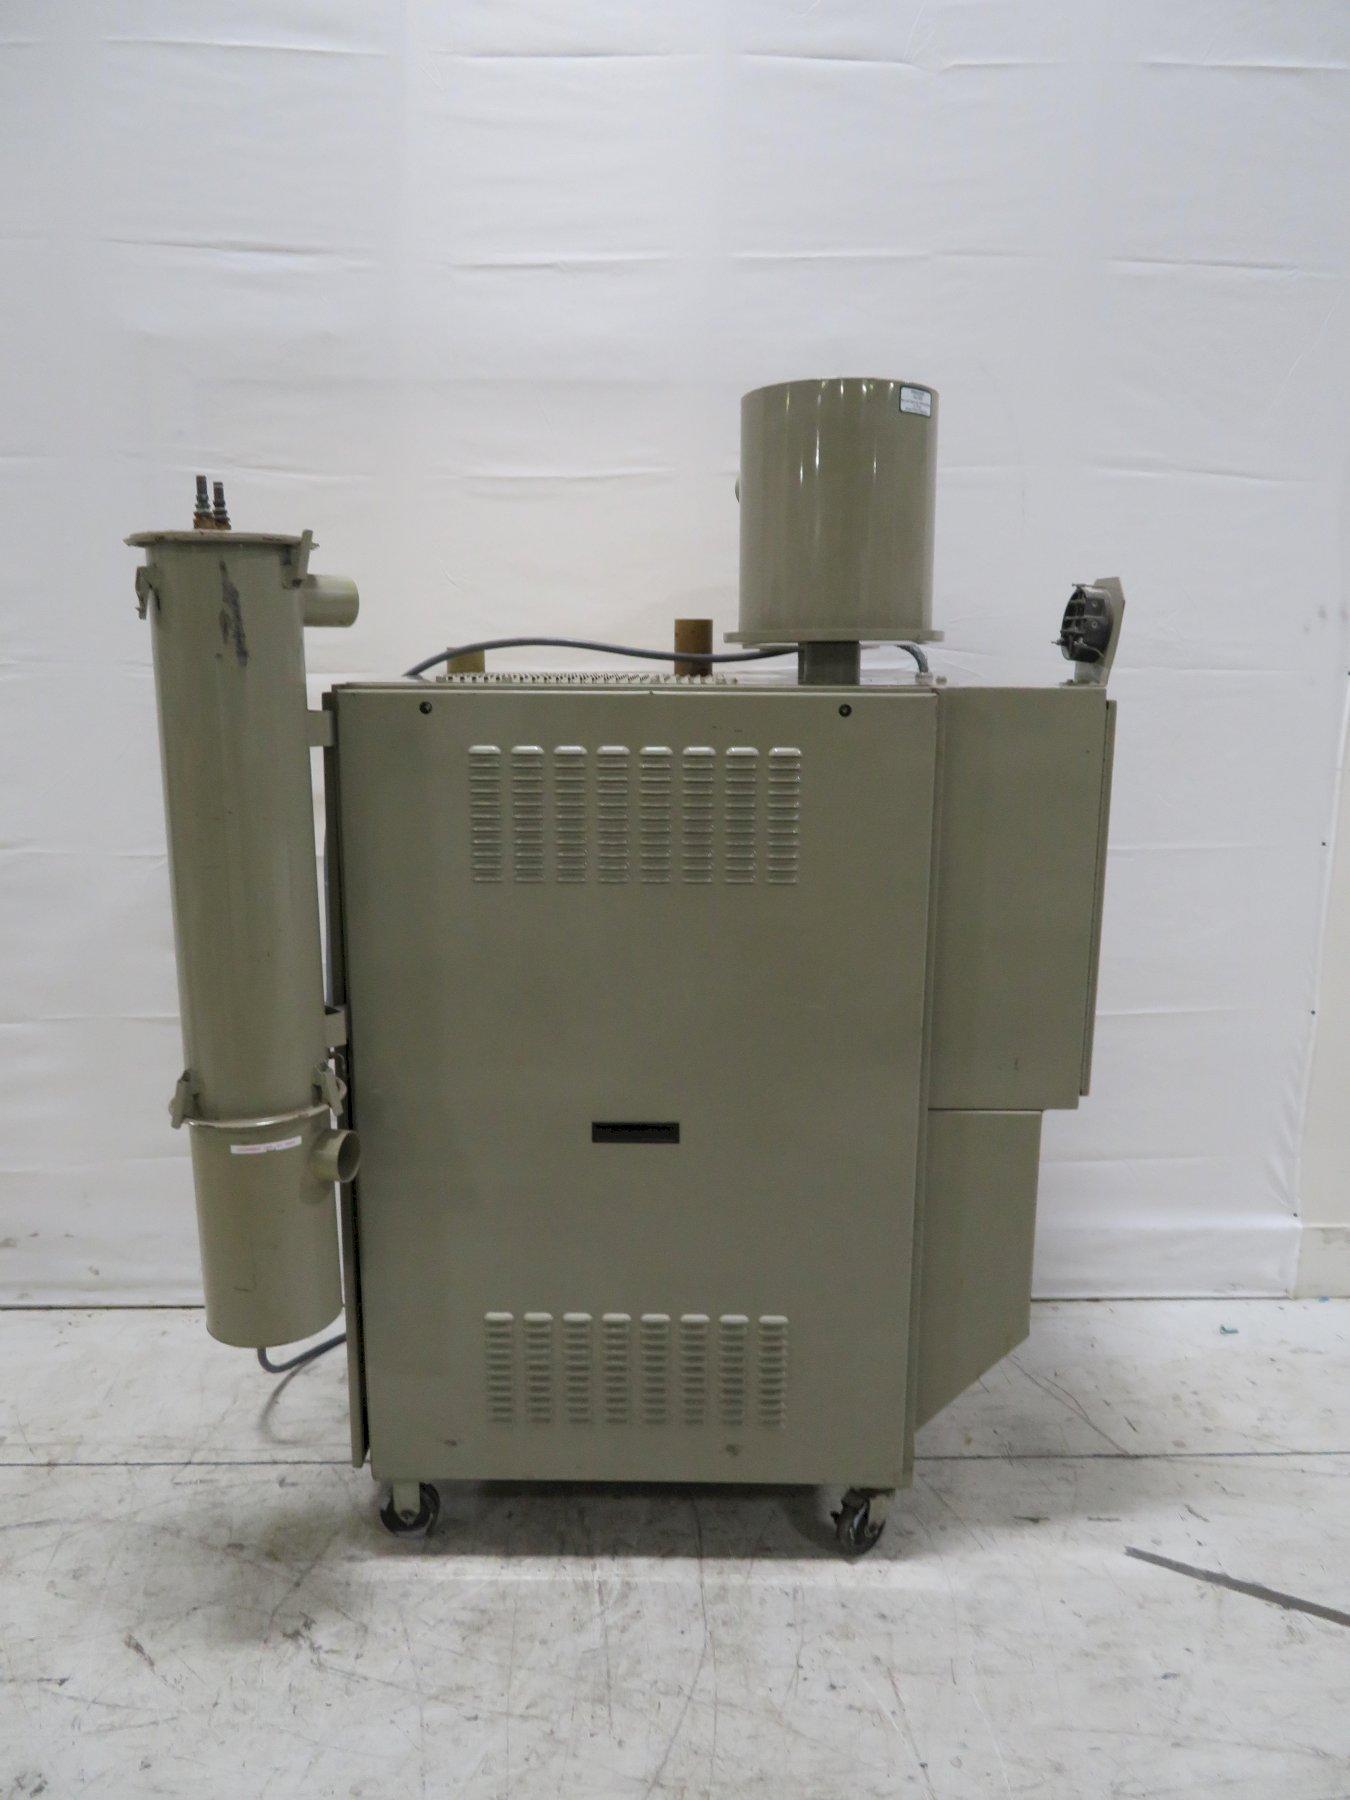 Conair Used CD200 Dryer Control, Approx. 300-400 lbs., 480V, Yr. 1995